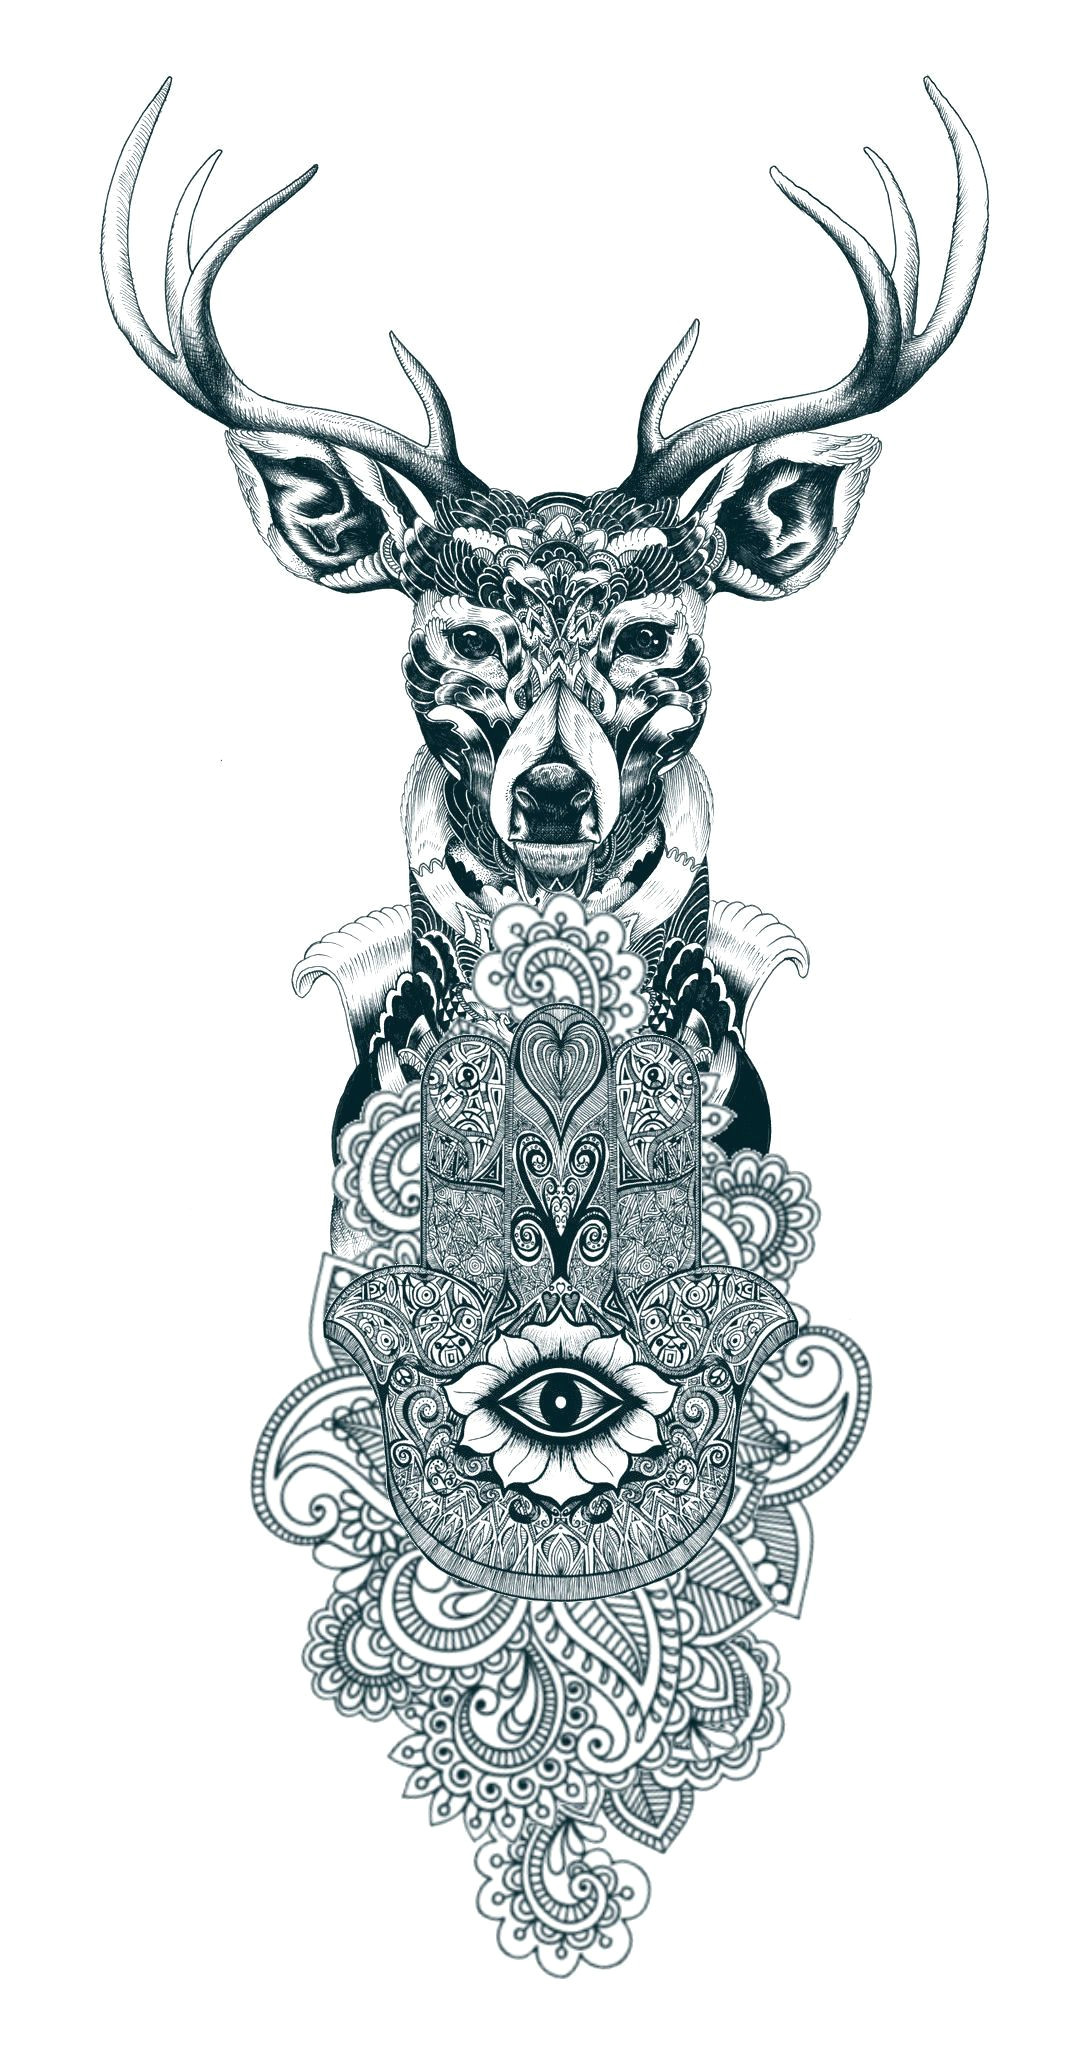 hamsa tattoo mandala tattoo mann mandala tattoo design lotus tattoo tattoo designs